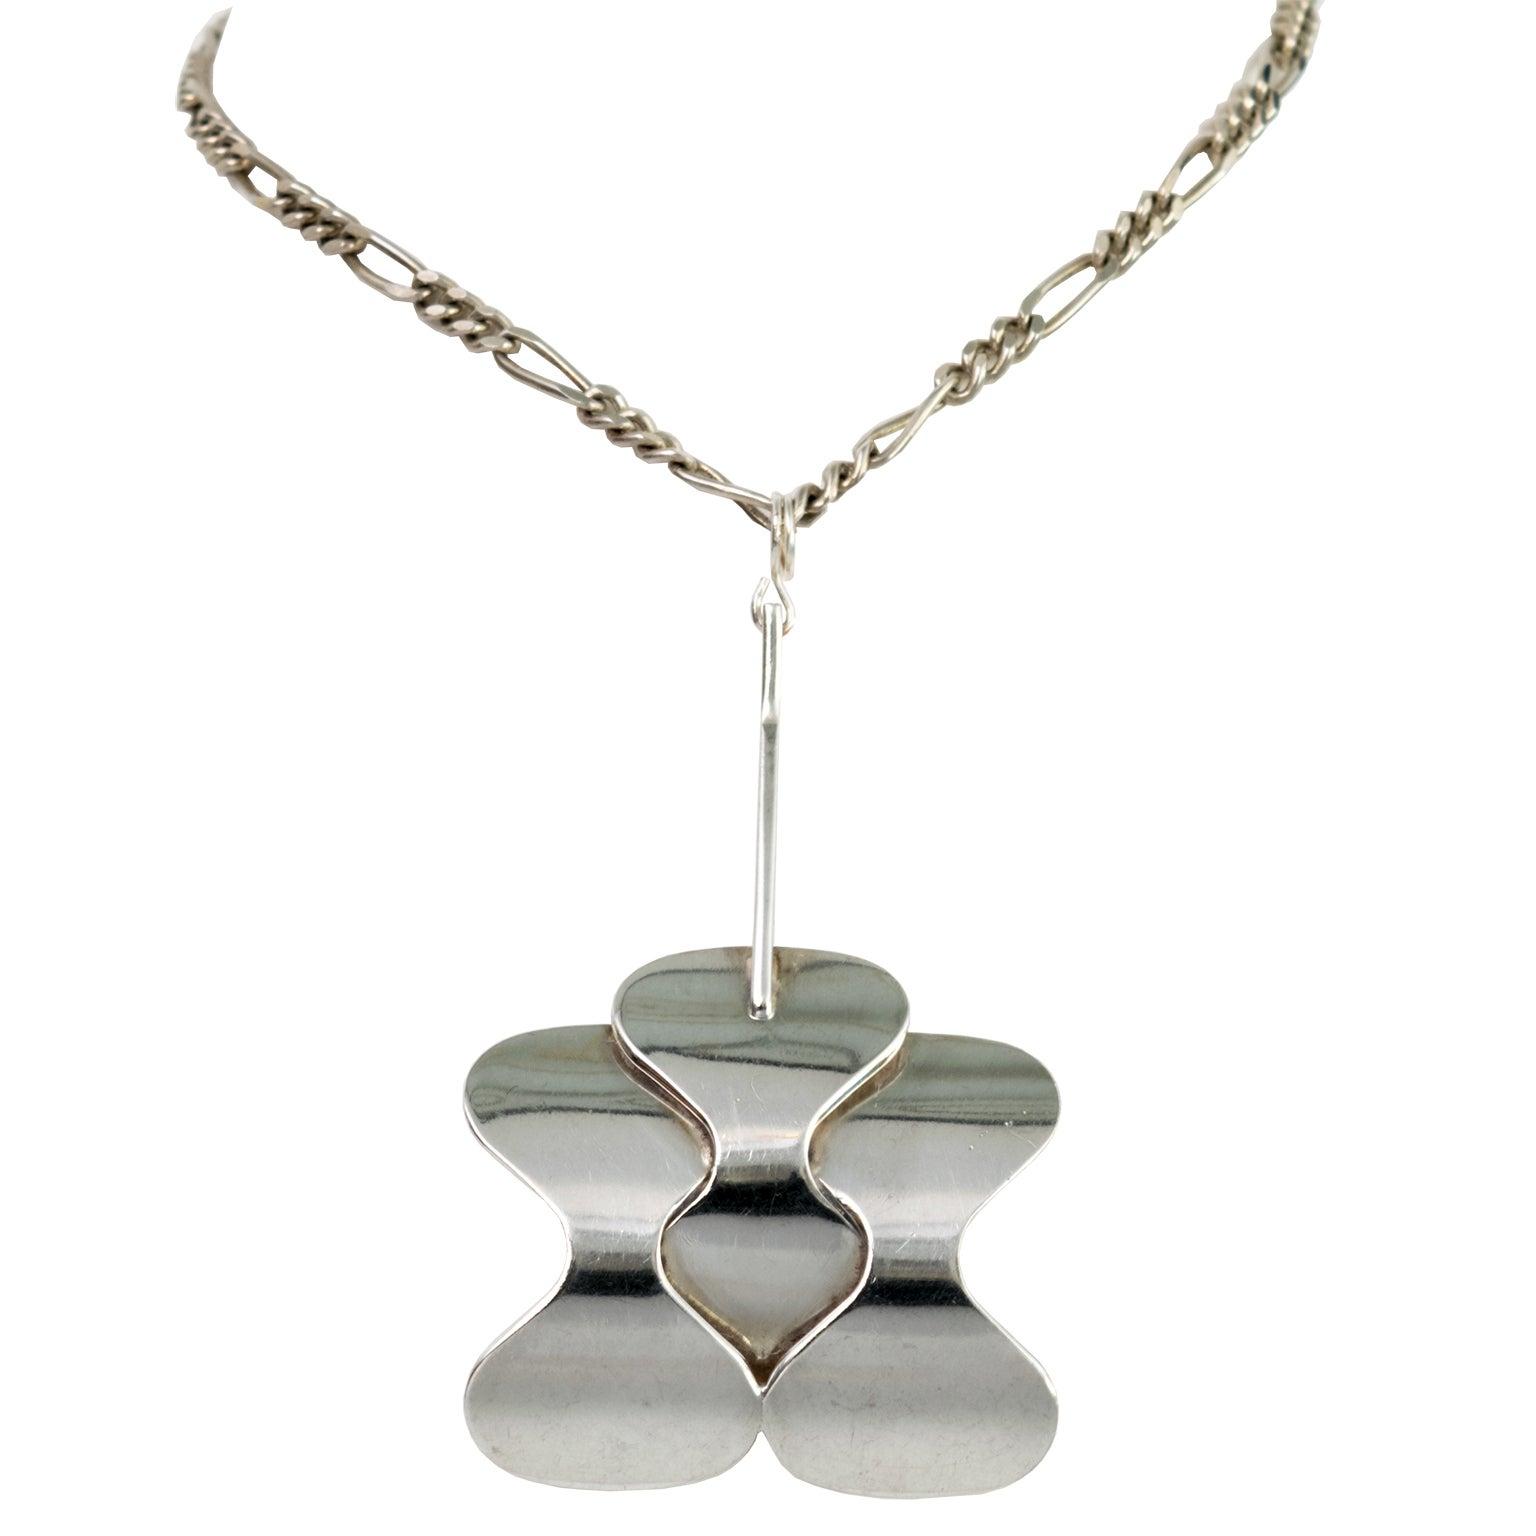 Silver Scandinavian Modern Pendant and Chain from Hopeajaloste OY